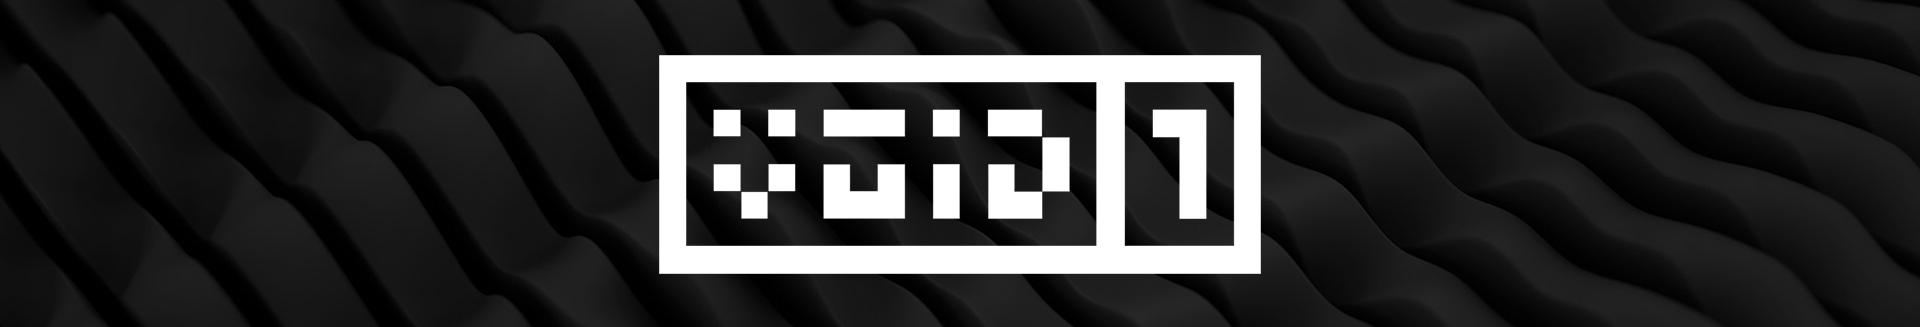 Platformer Music Pack LITE